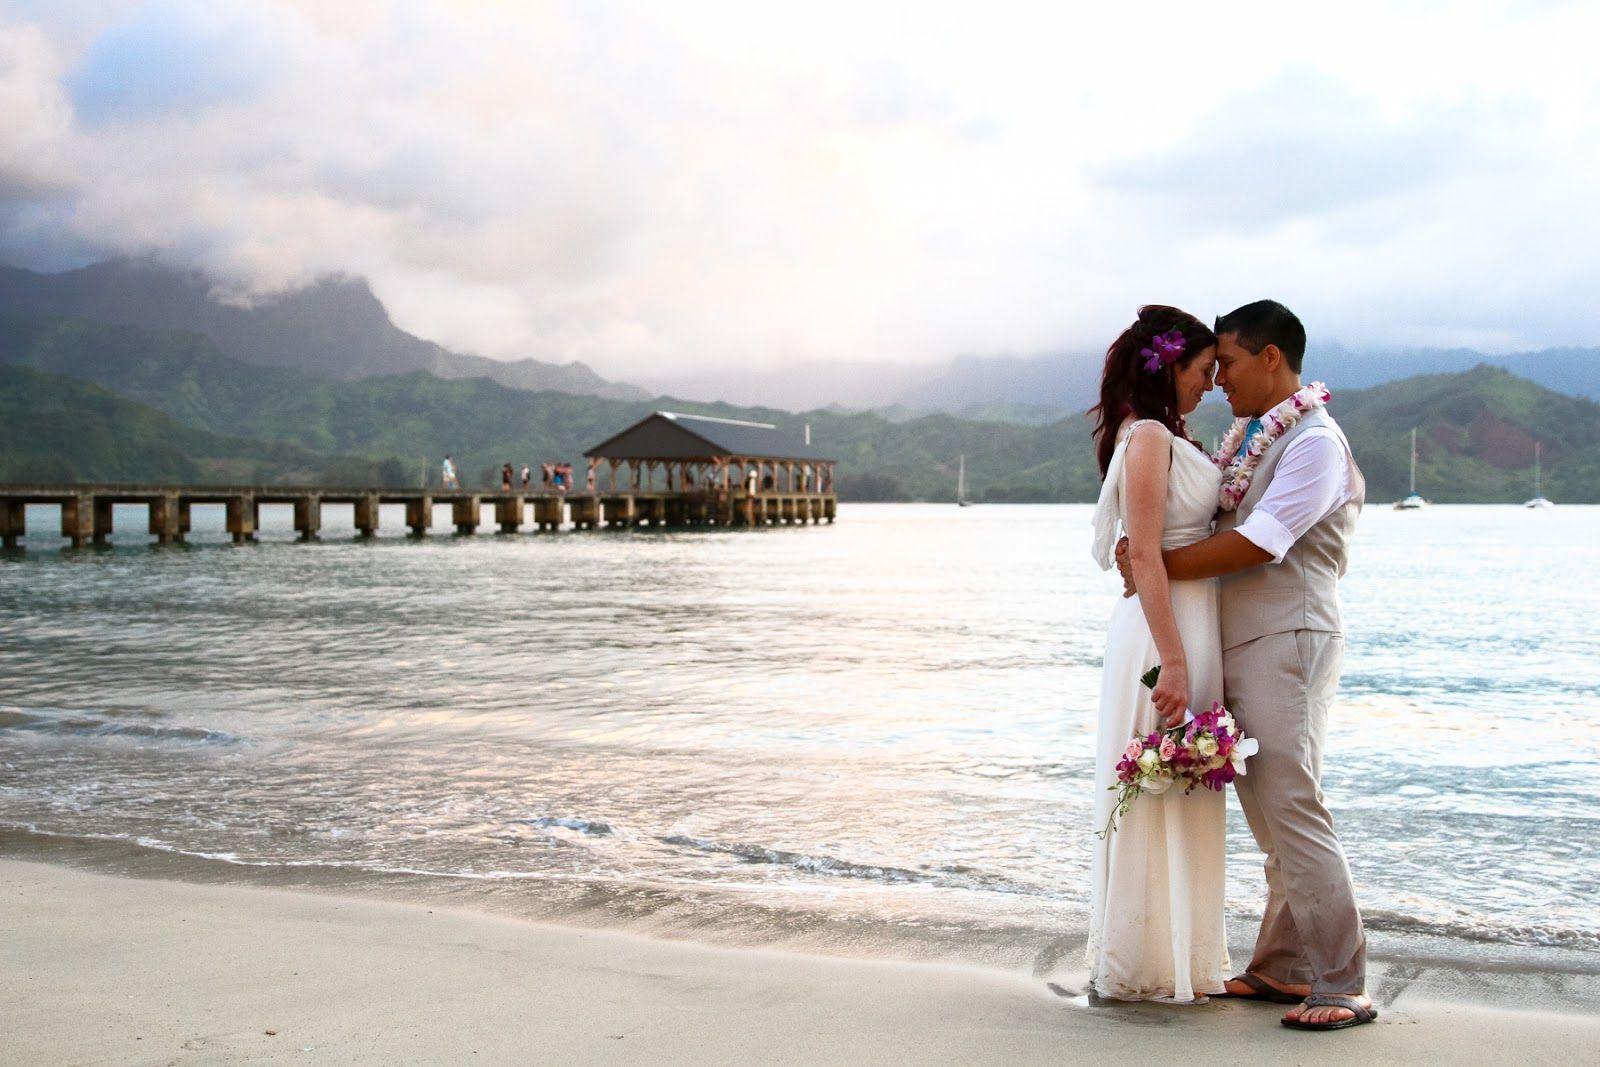 Hanalei dream kauai beach weddings pinterest florists beach